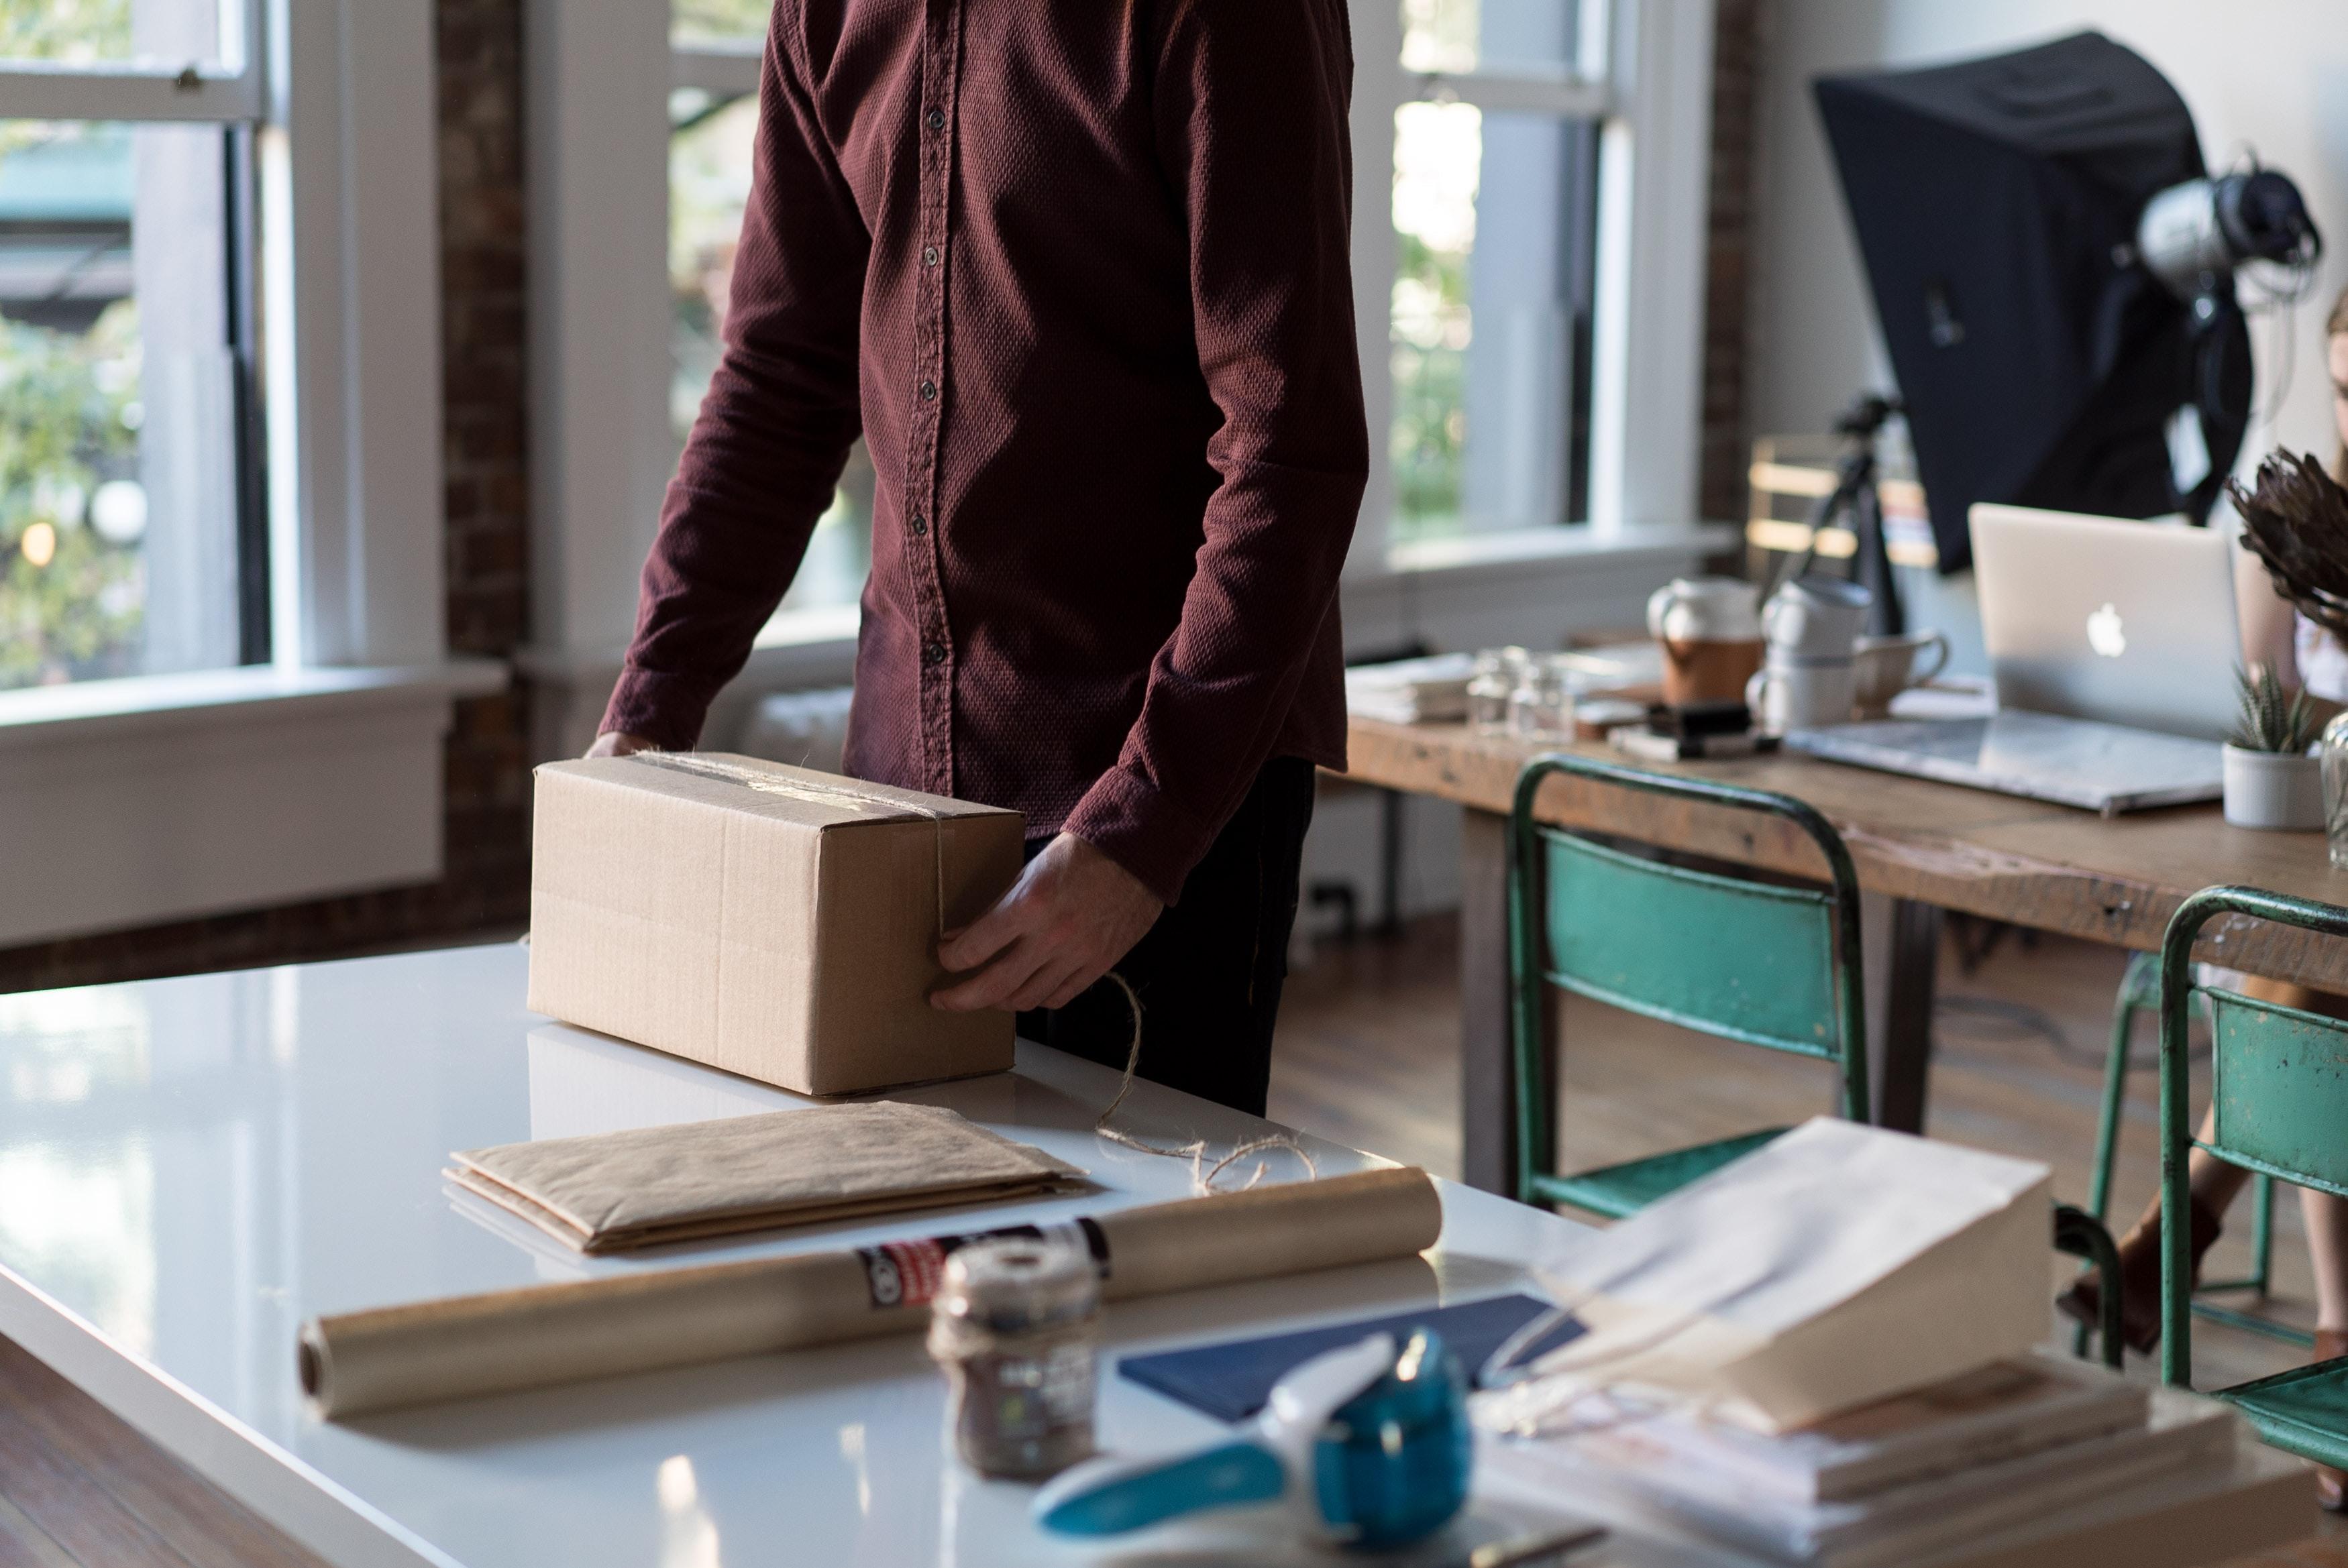 Man preparing box for shipment